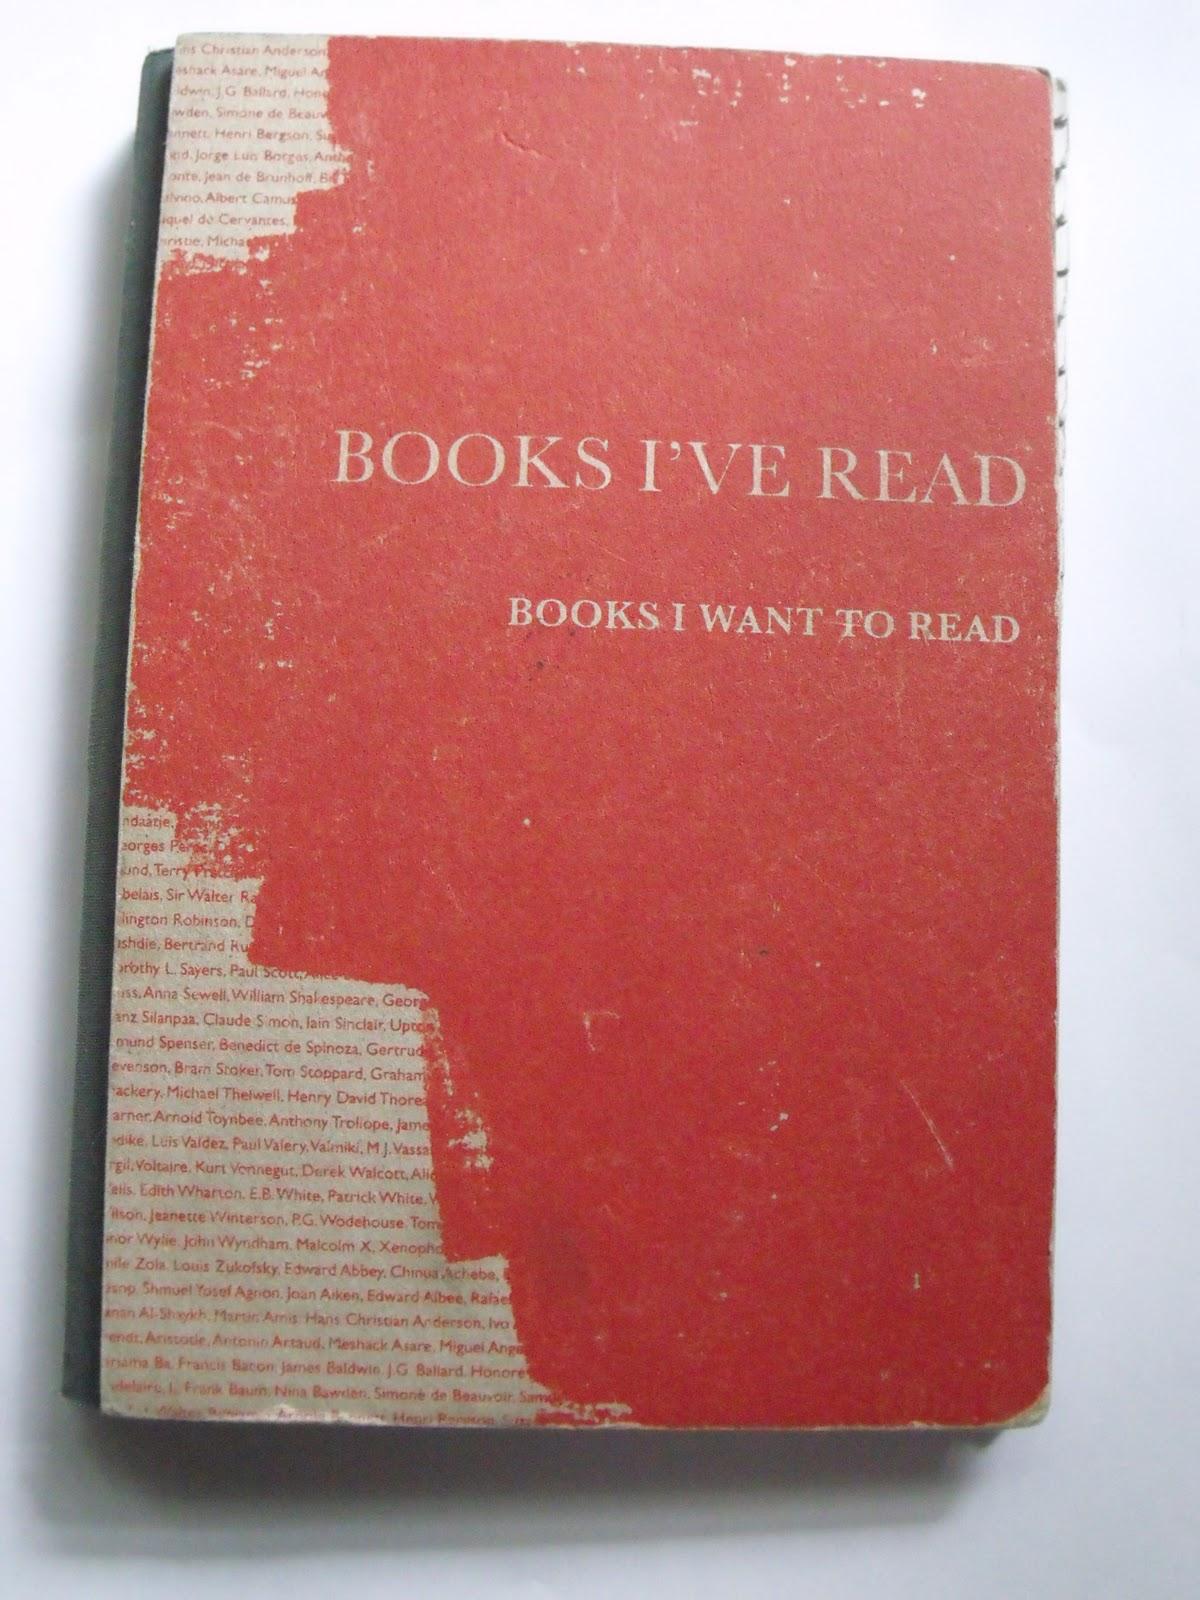 books books books keeping track of my books